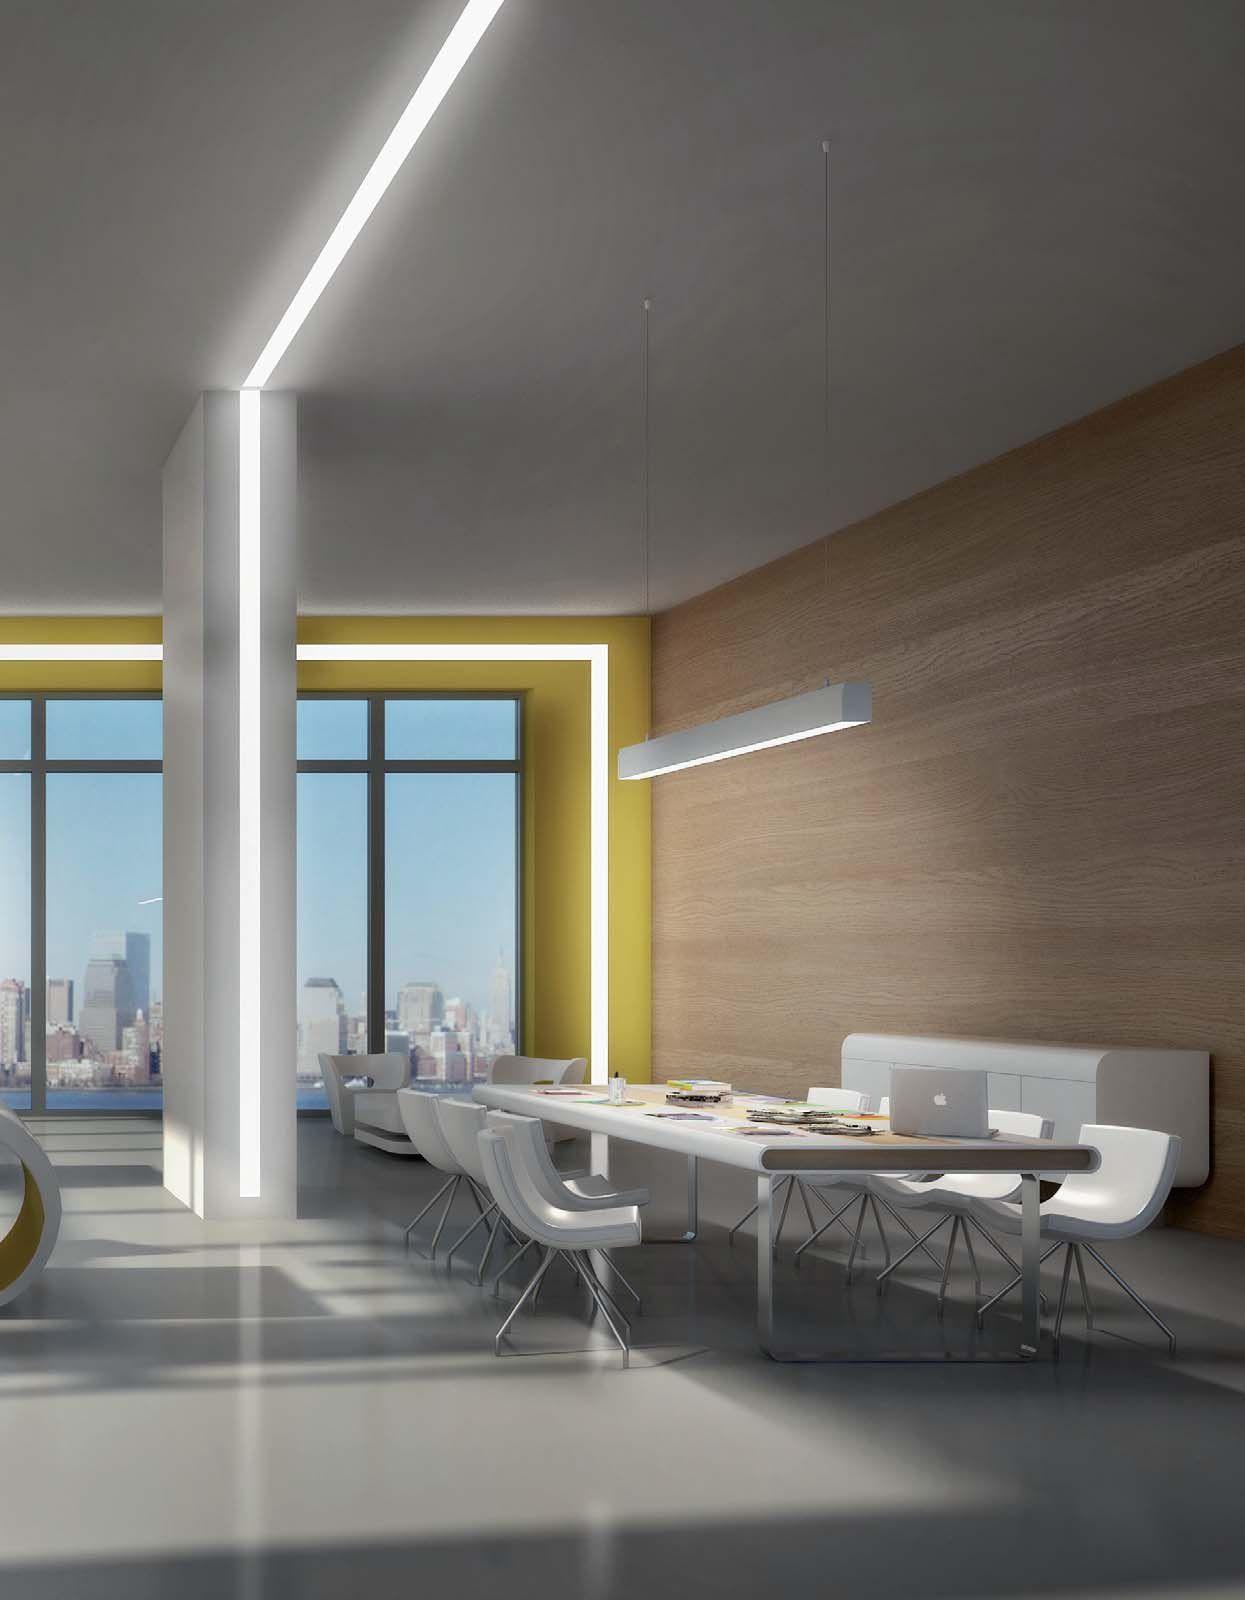 Lighting Design, Lighting Ideas, Lamp Ideas, Office Designs, Office Ideas,